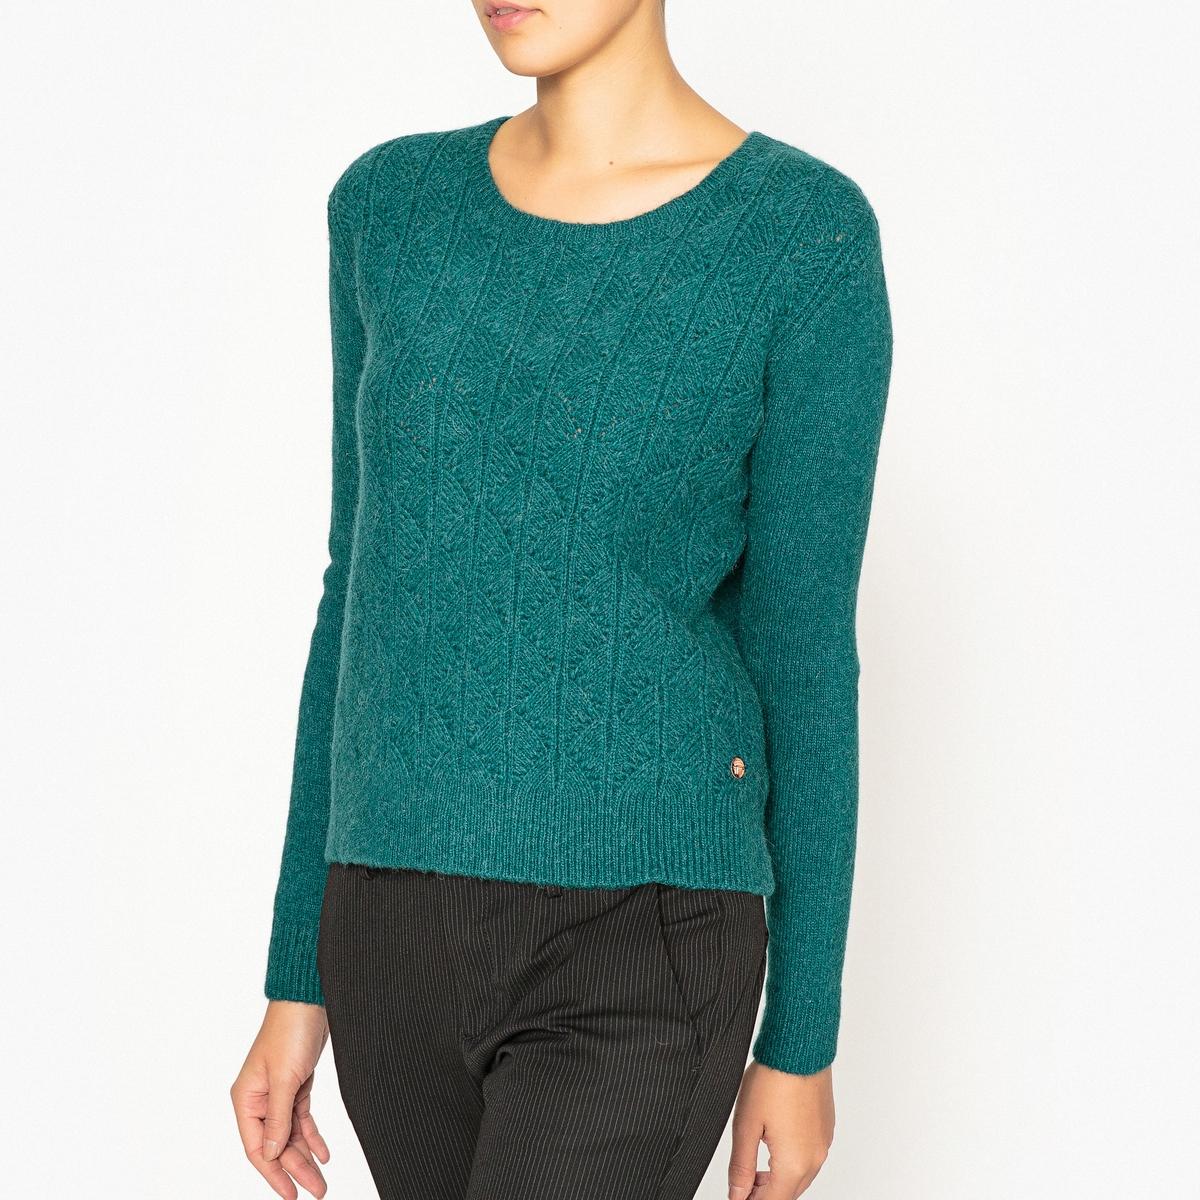 Пуловер из оригинального трикотажа MELI